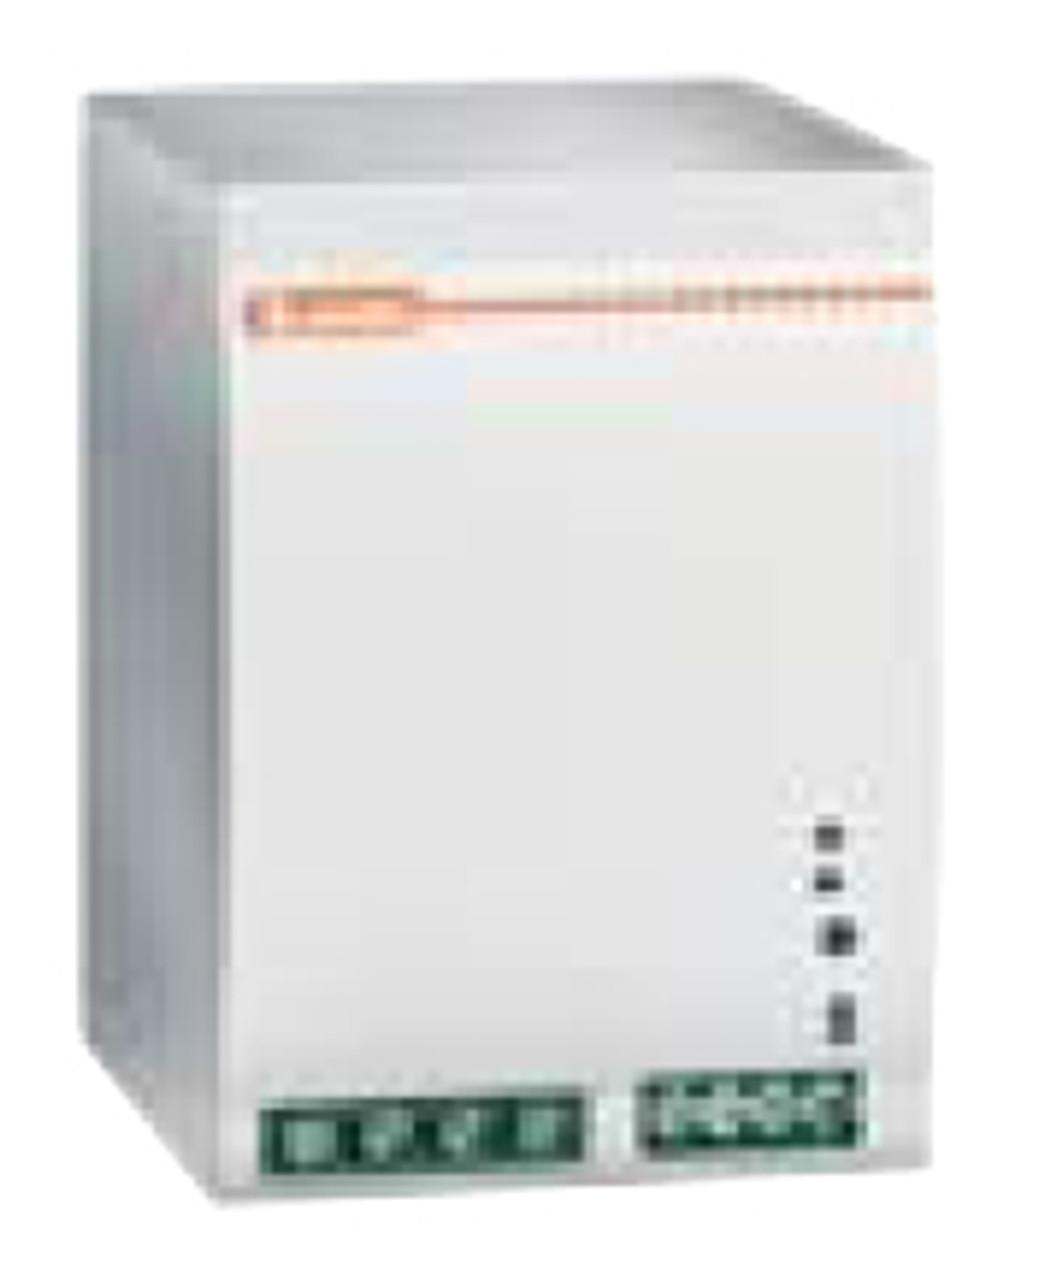 PSL324024